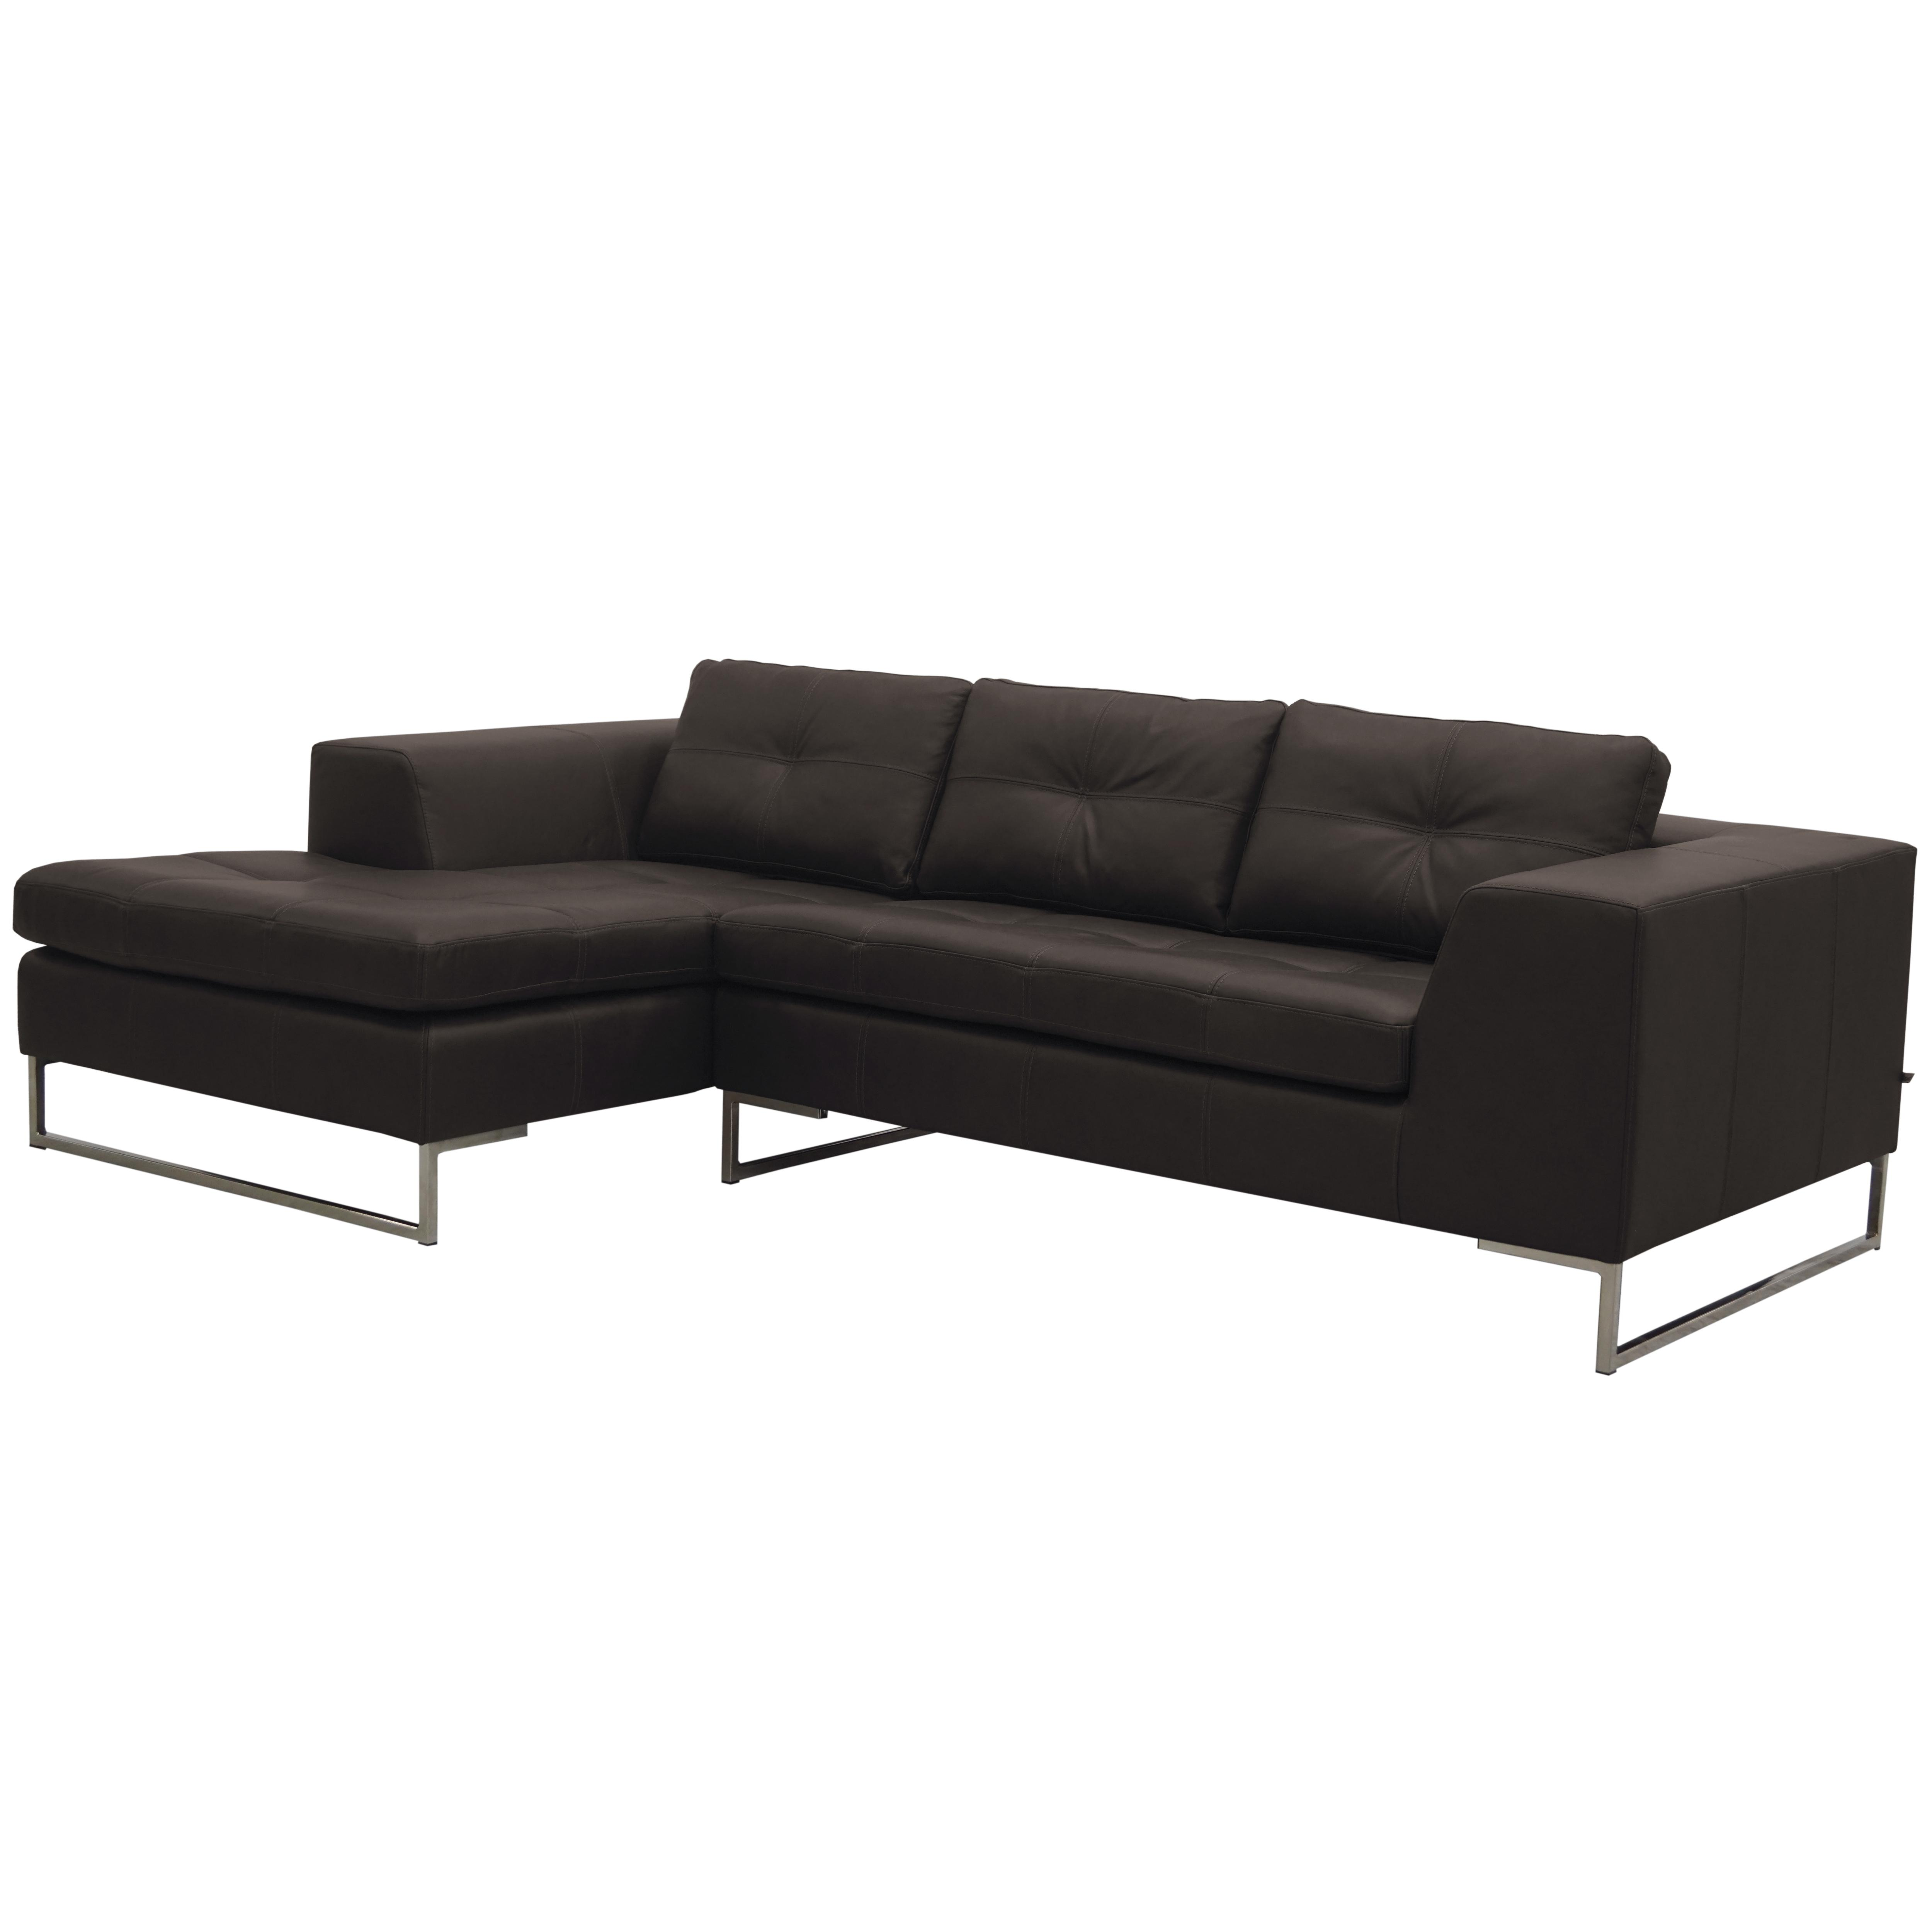 Toleda left hand facing three seater chaise sofa mollis leather khaki brown